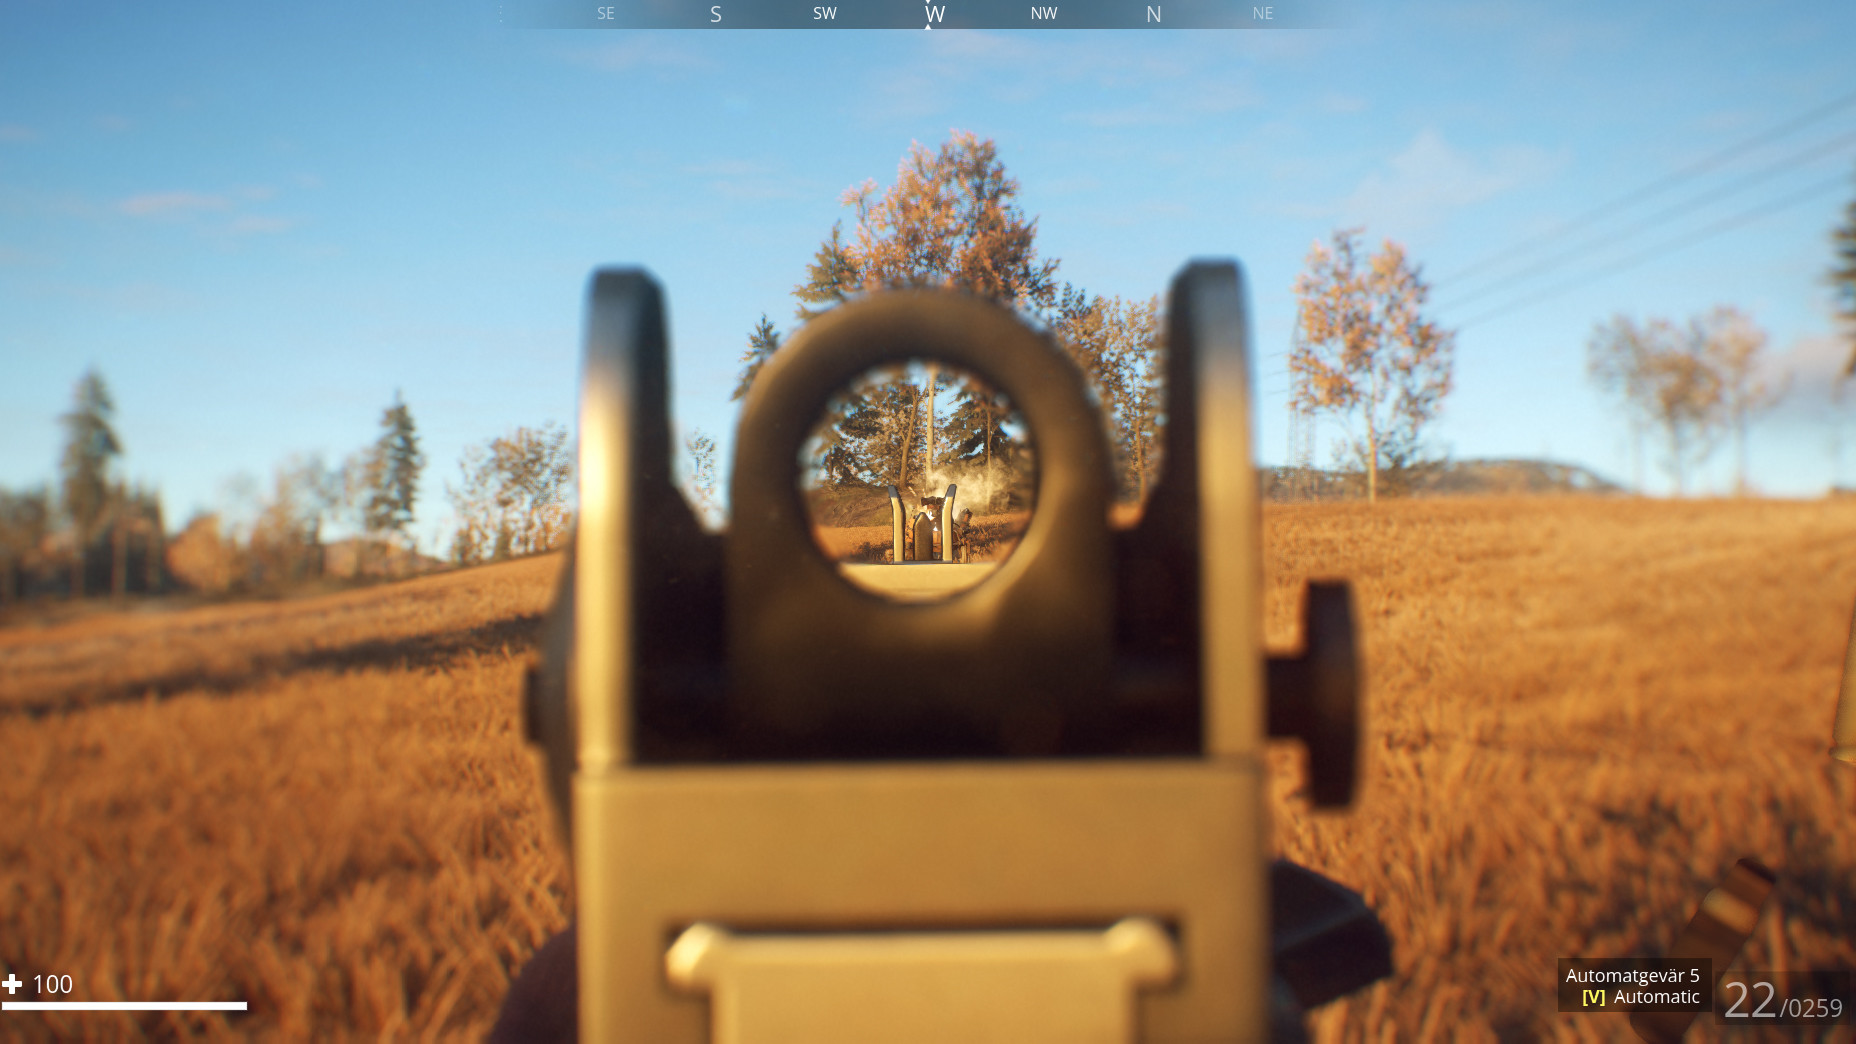 Daniel ketterman assault rifle3 ig